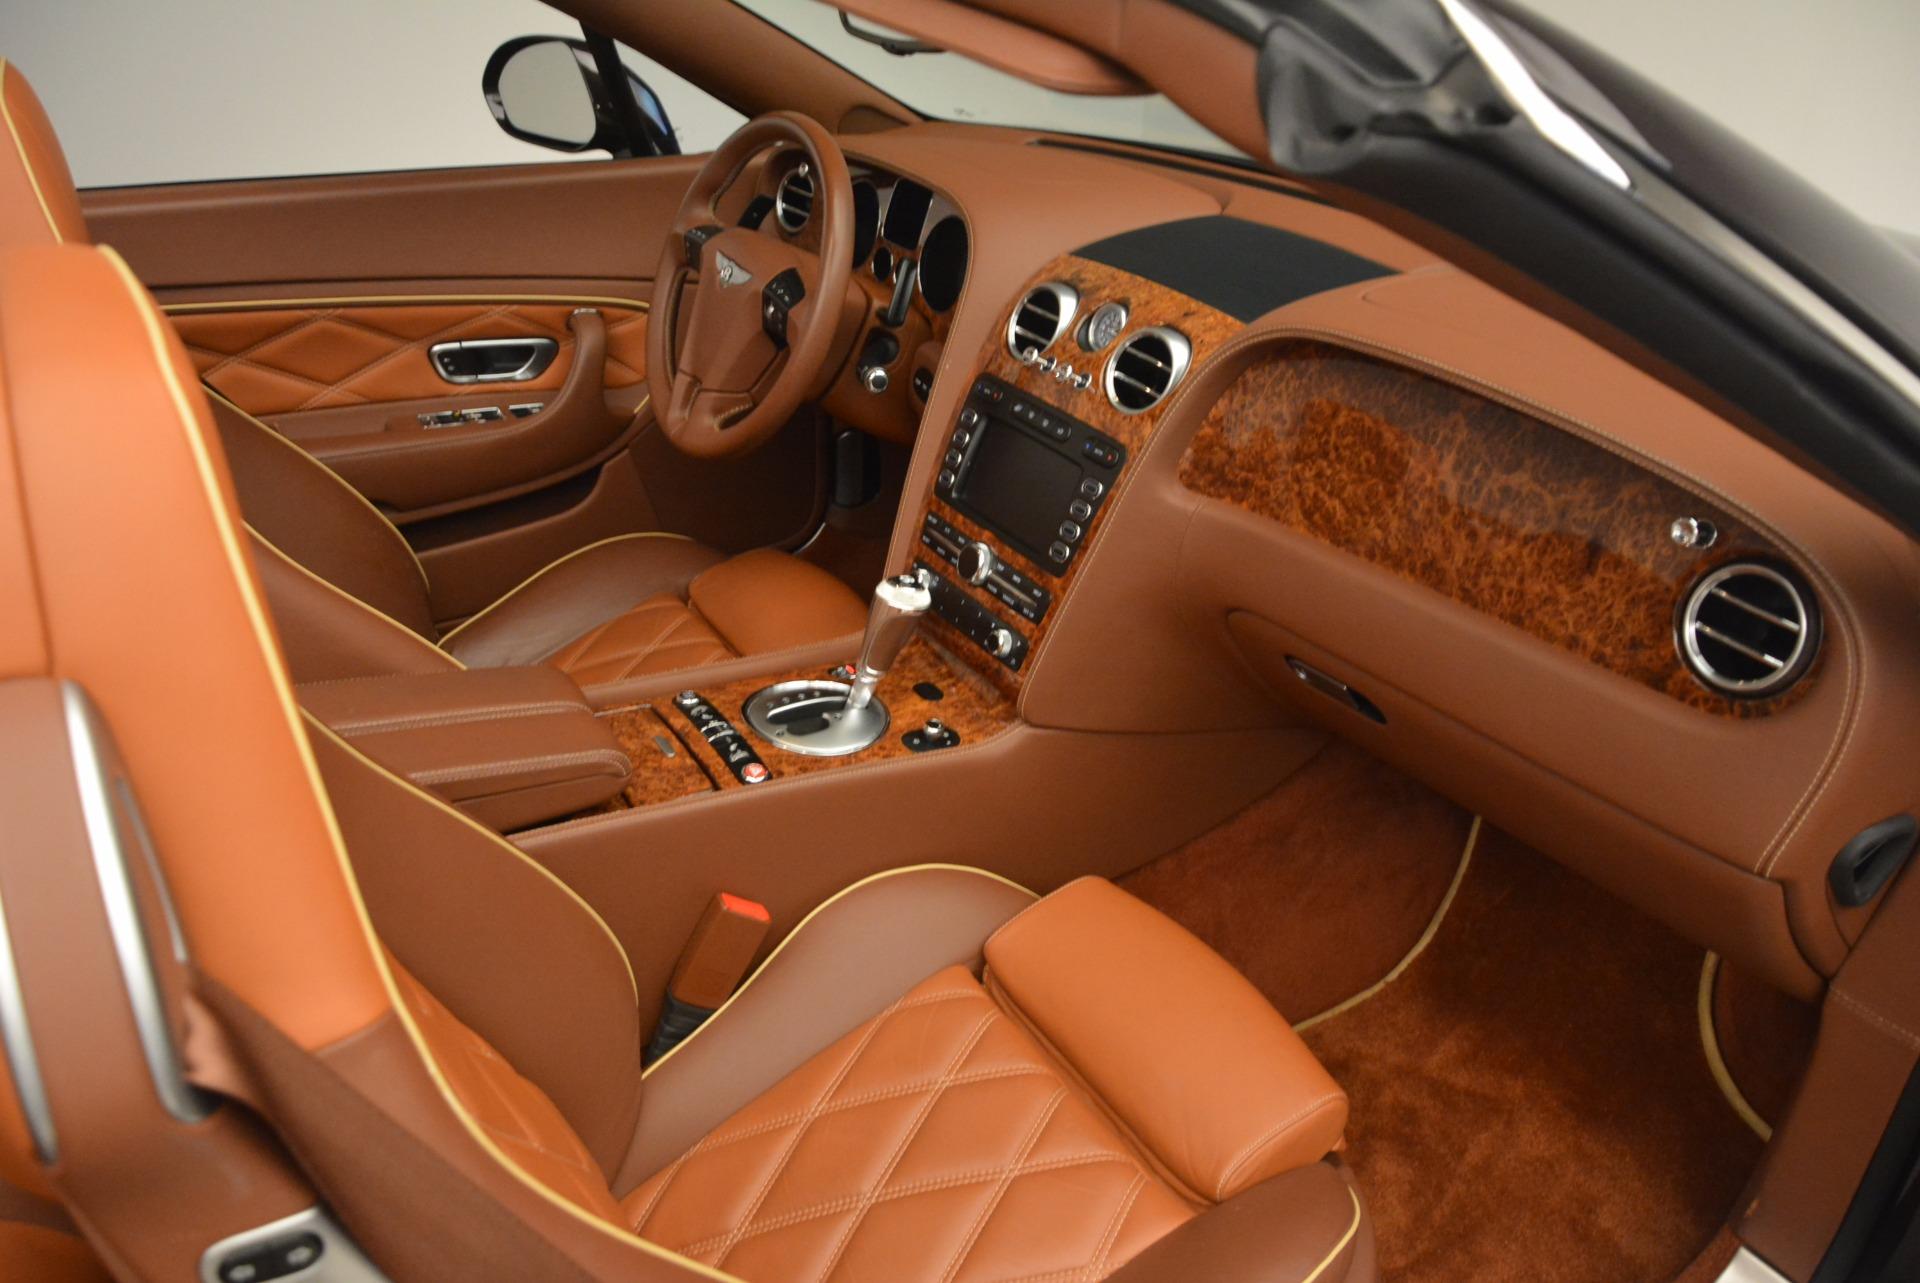 Used 2010 Bentley Continental GT Series 51 For Sale In Westport, CT 1222_p41